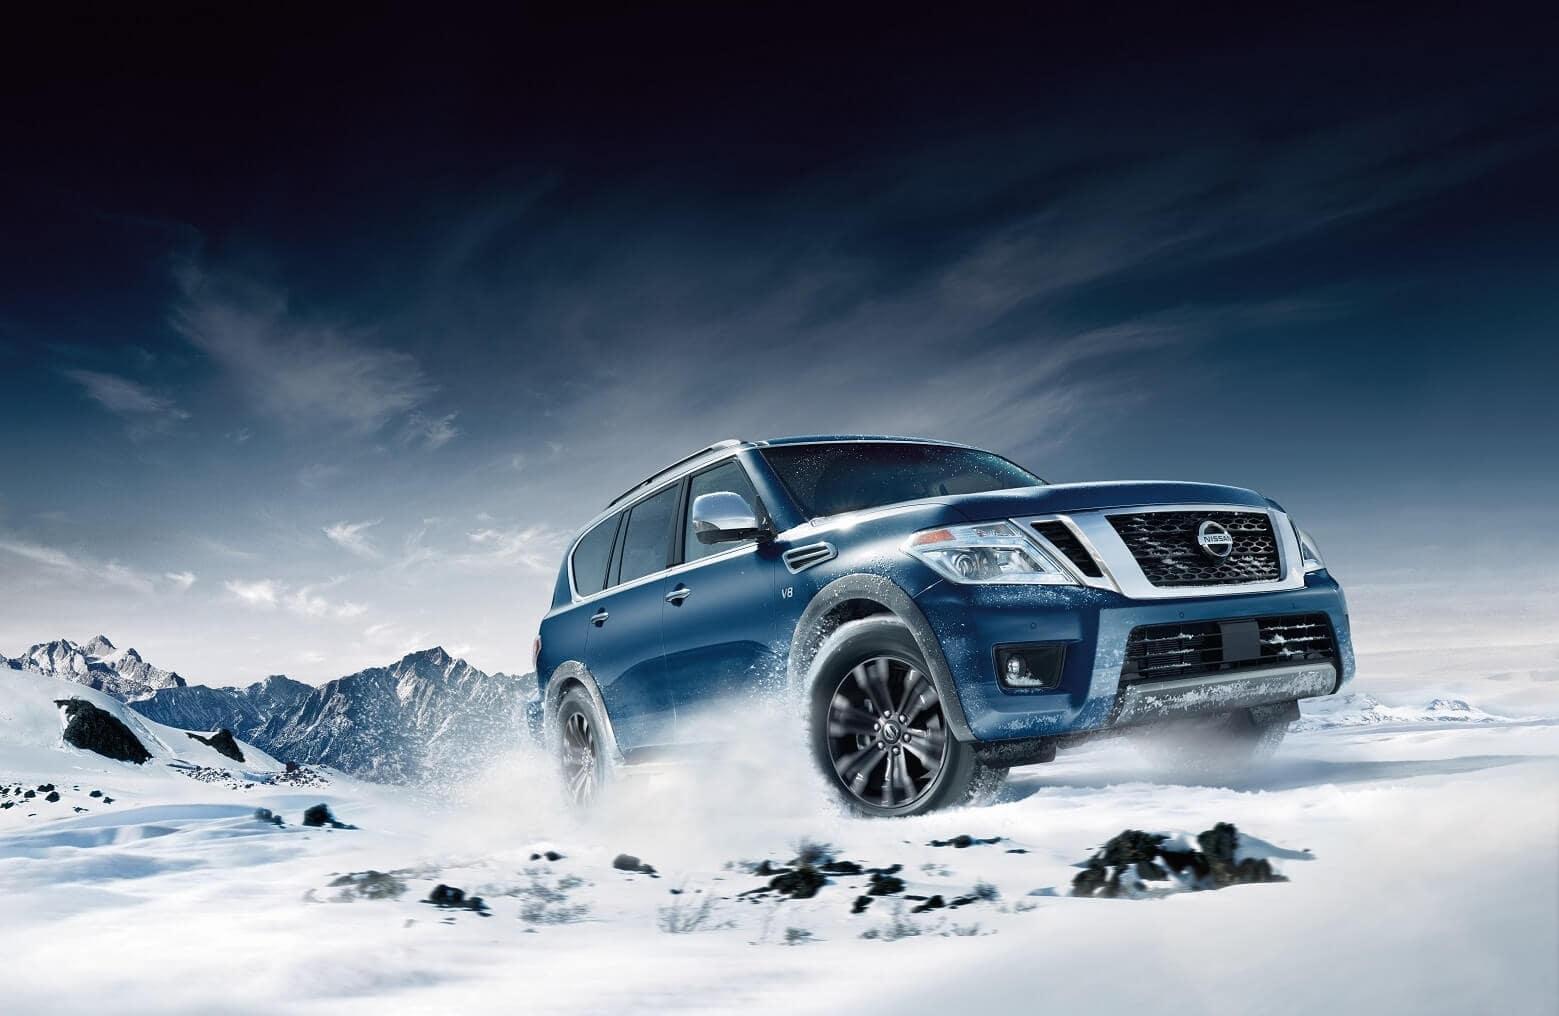 Nissan Armada Off-Roading